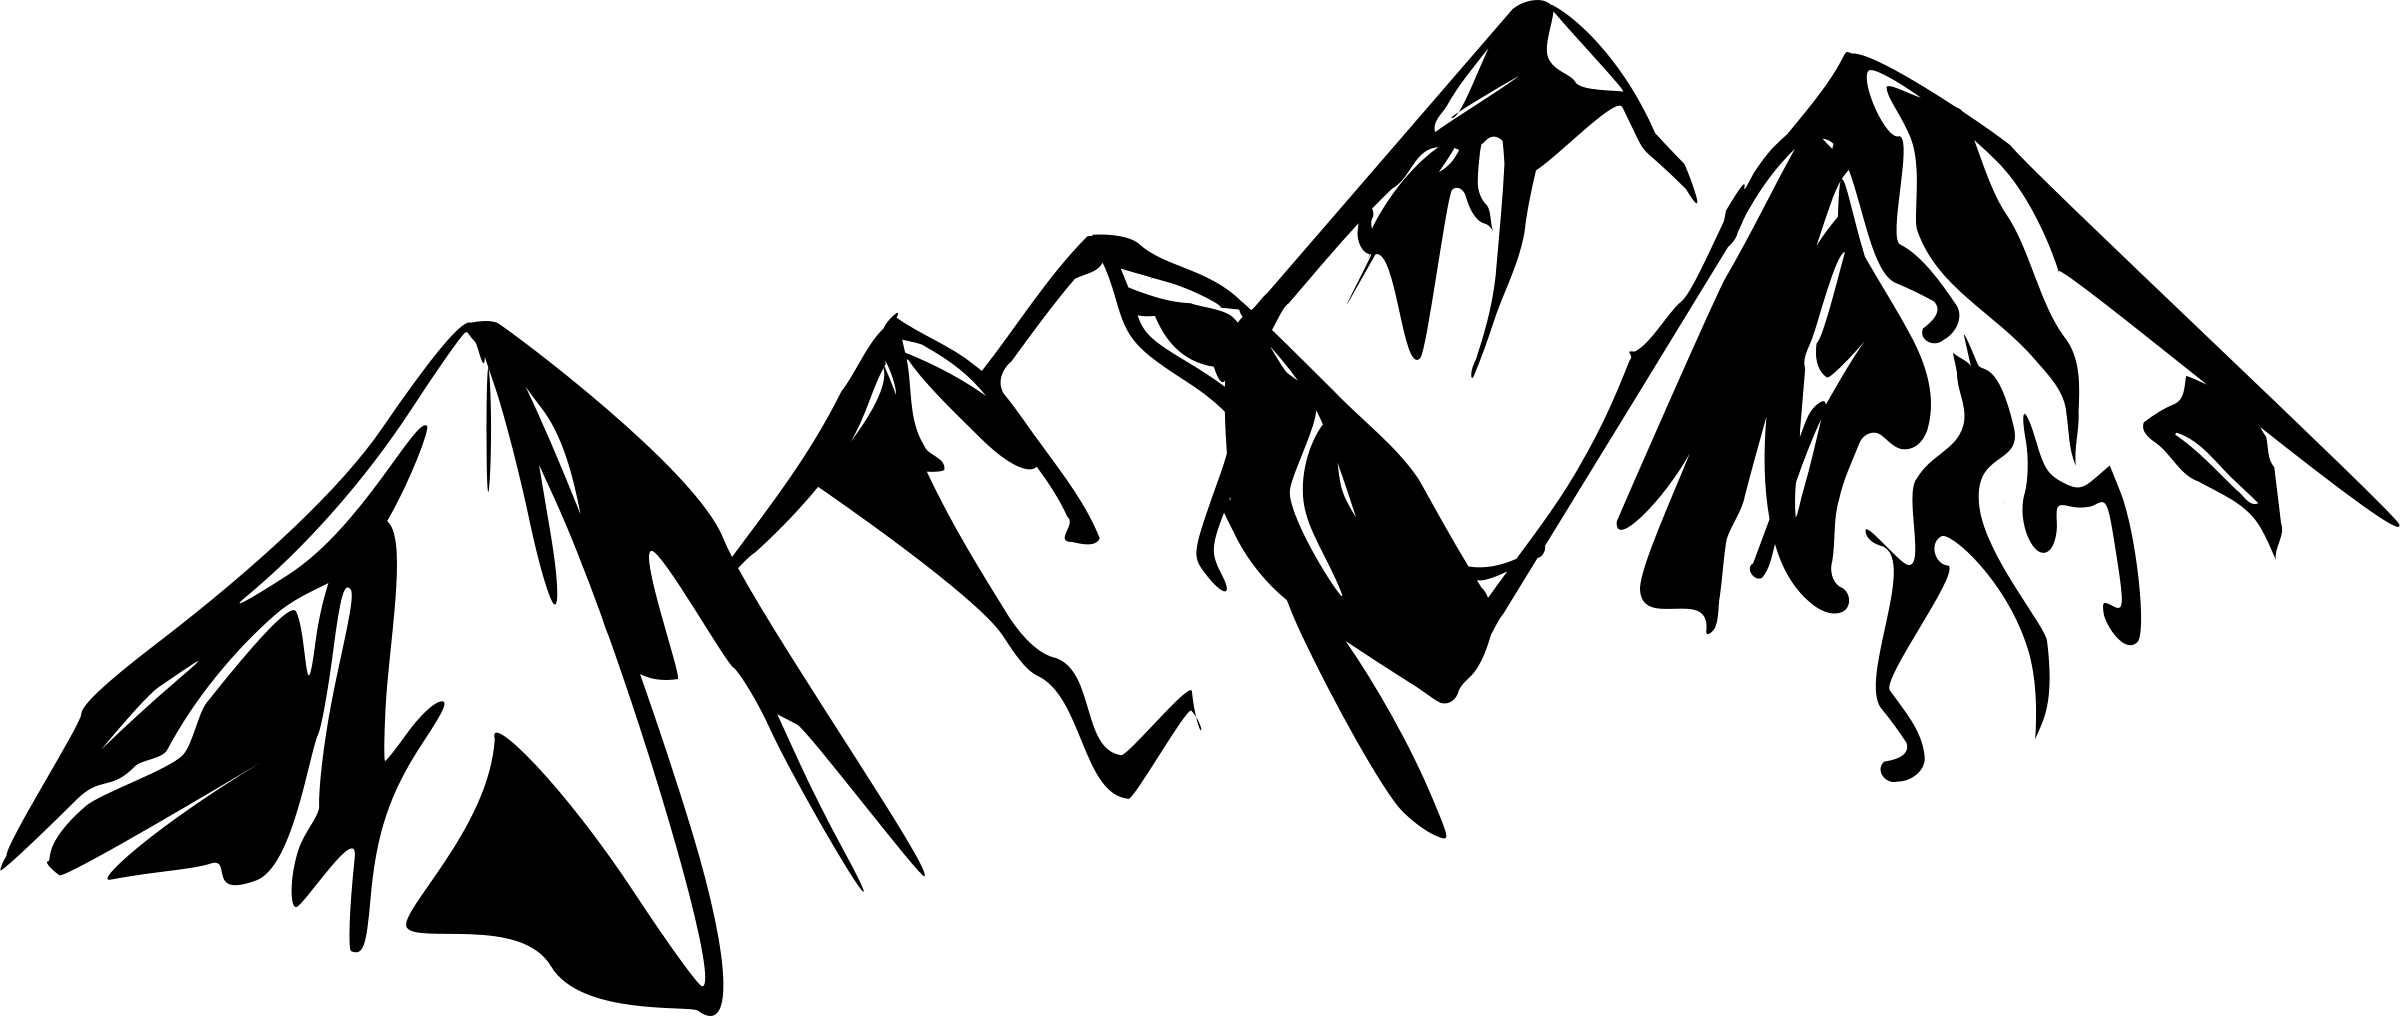 Mountain outline. Range for undercut tattoo